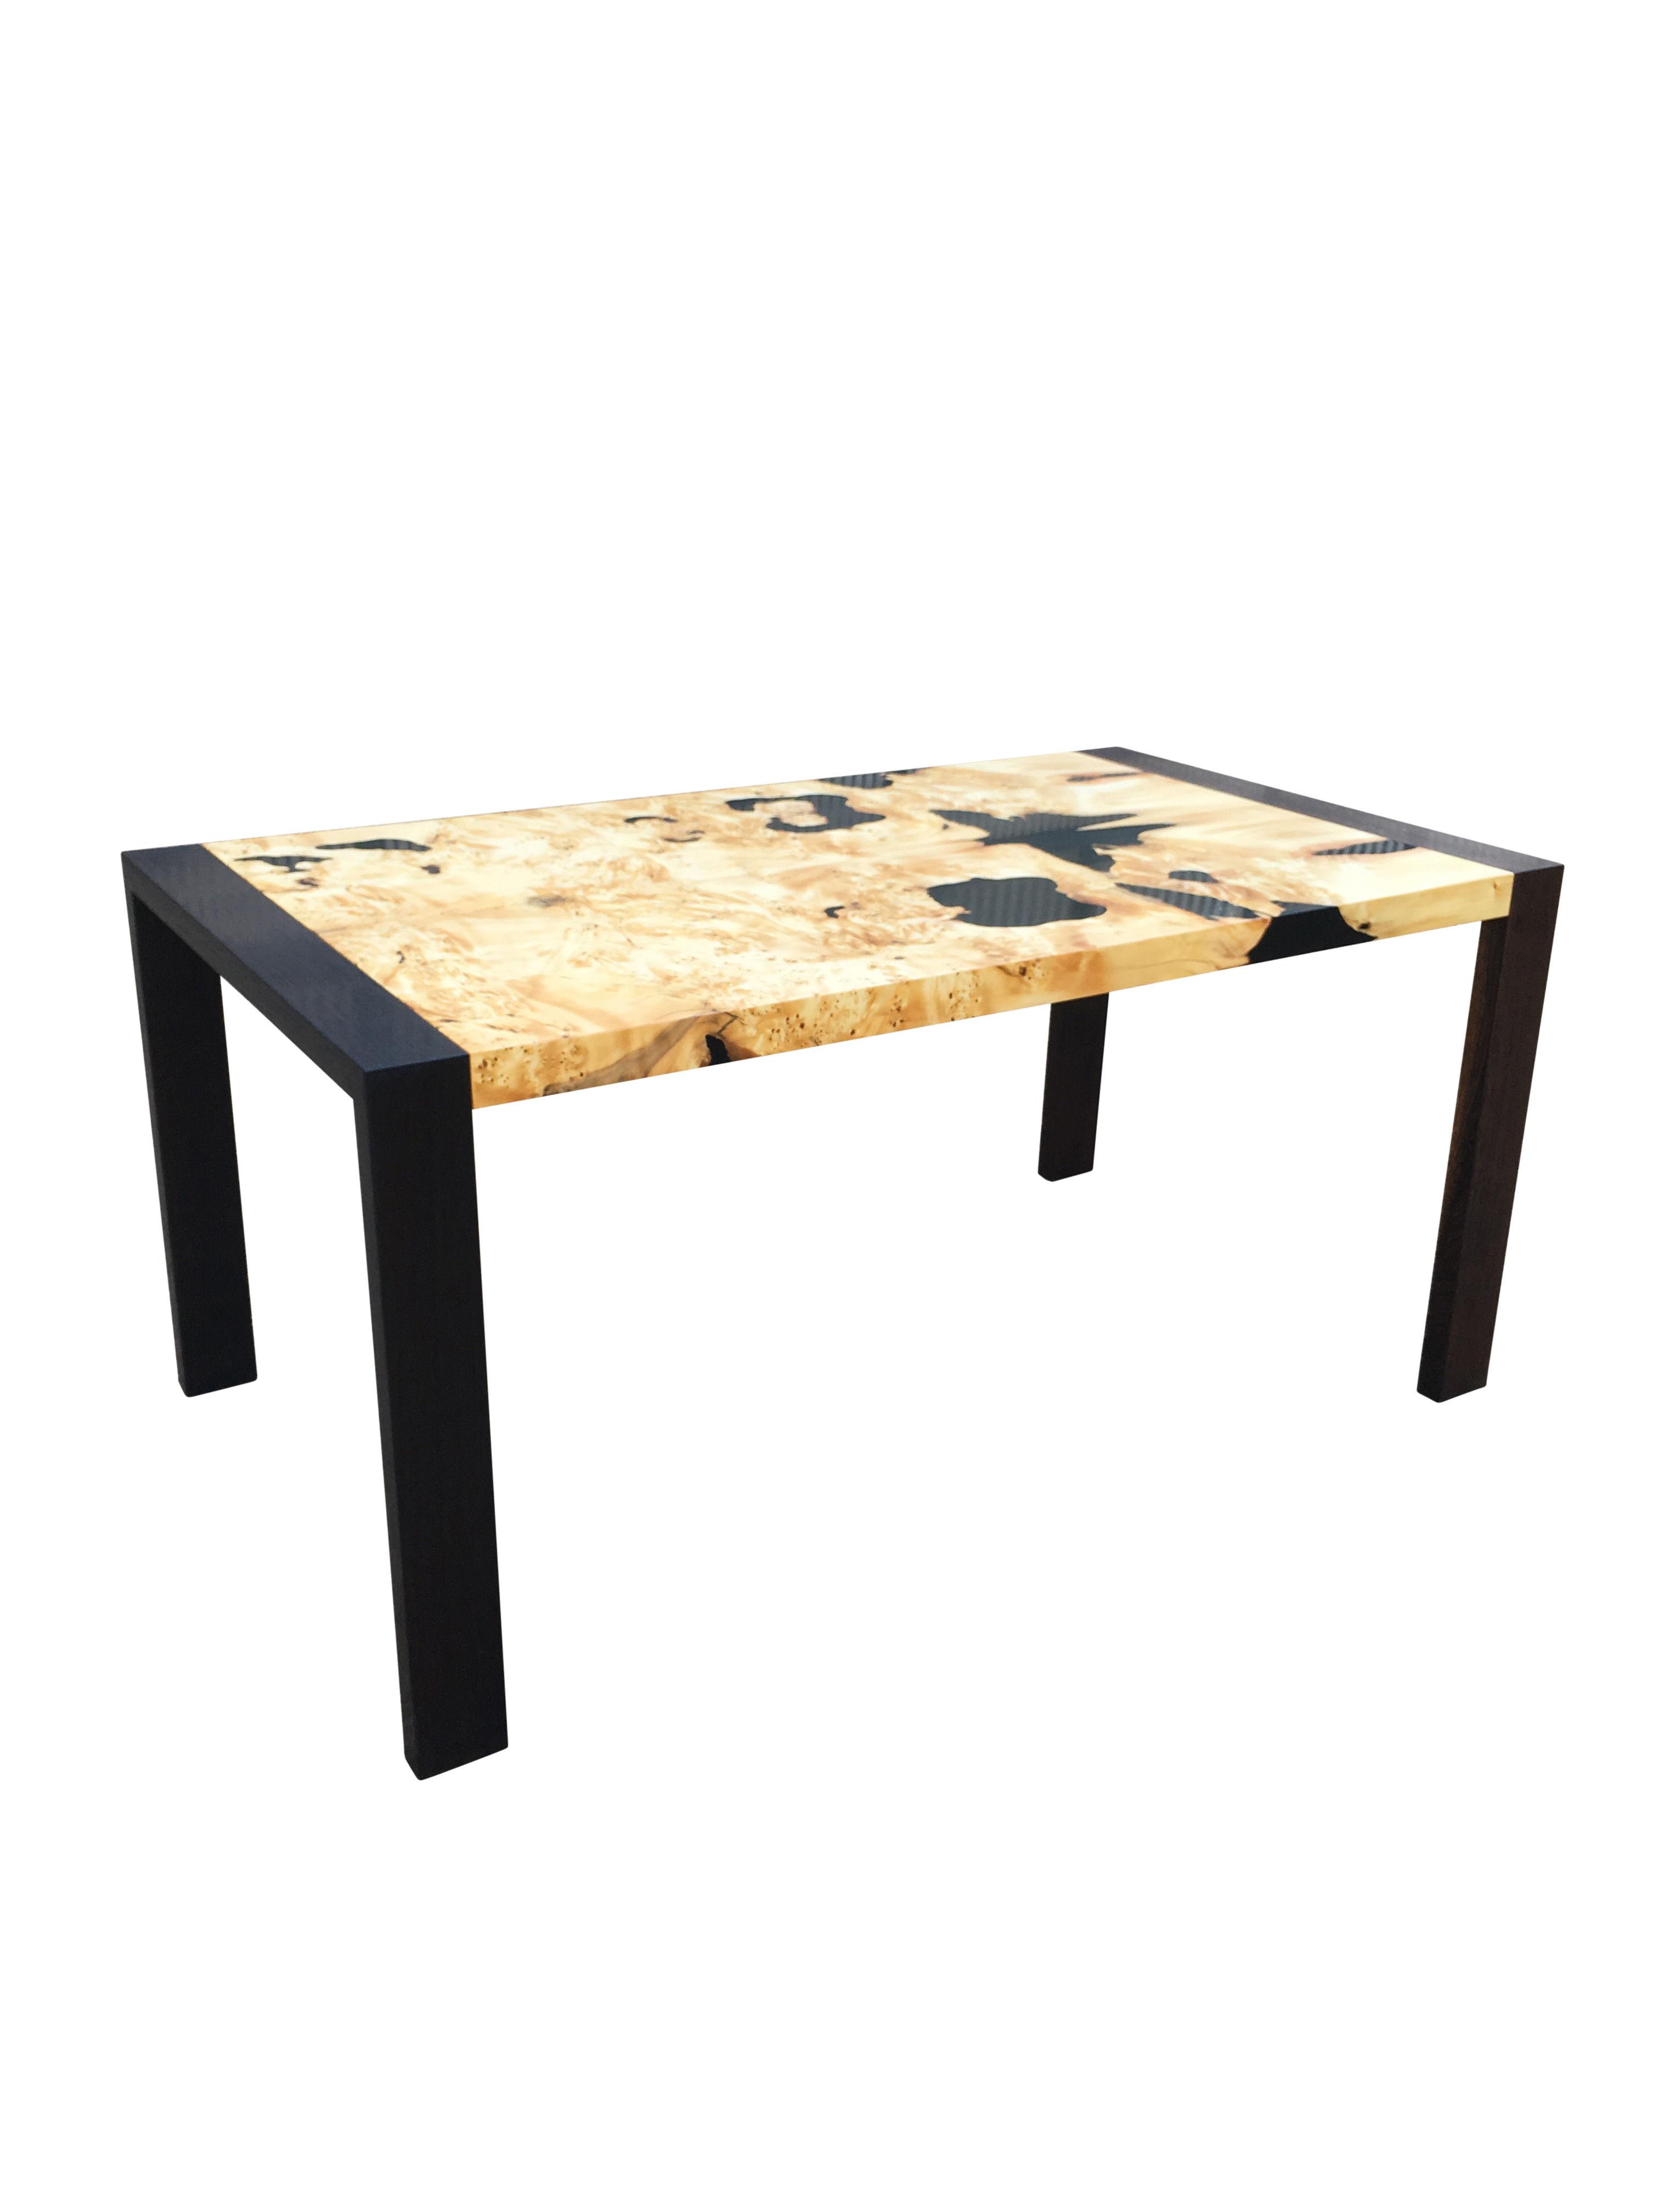 Custom Handmade Solid Timber Dining Table